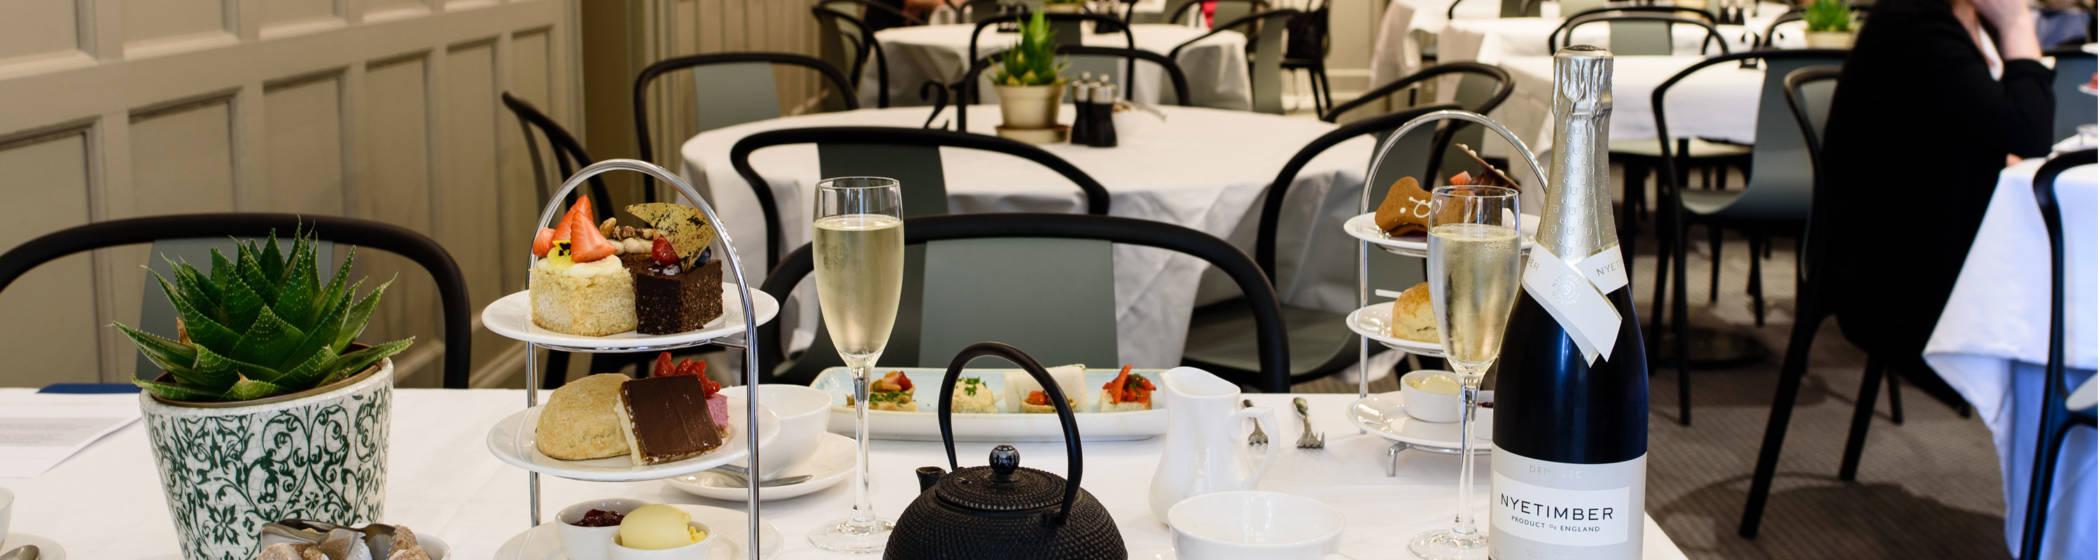 Vegan afternoon tea in the manor restaurant